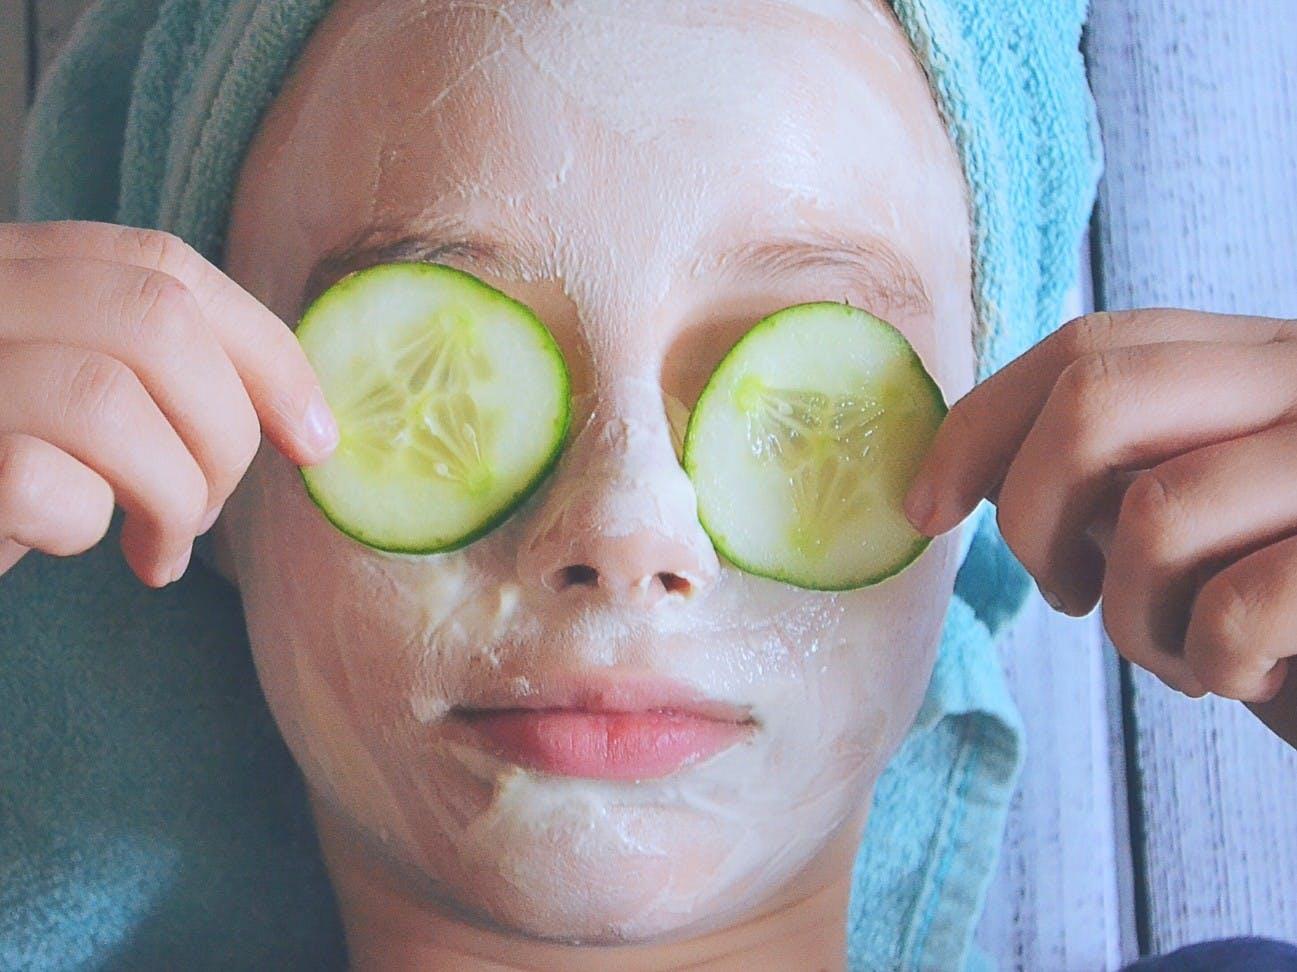 face masks chi soft winter skin 11.4